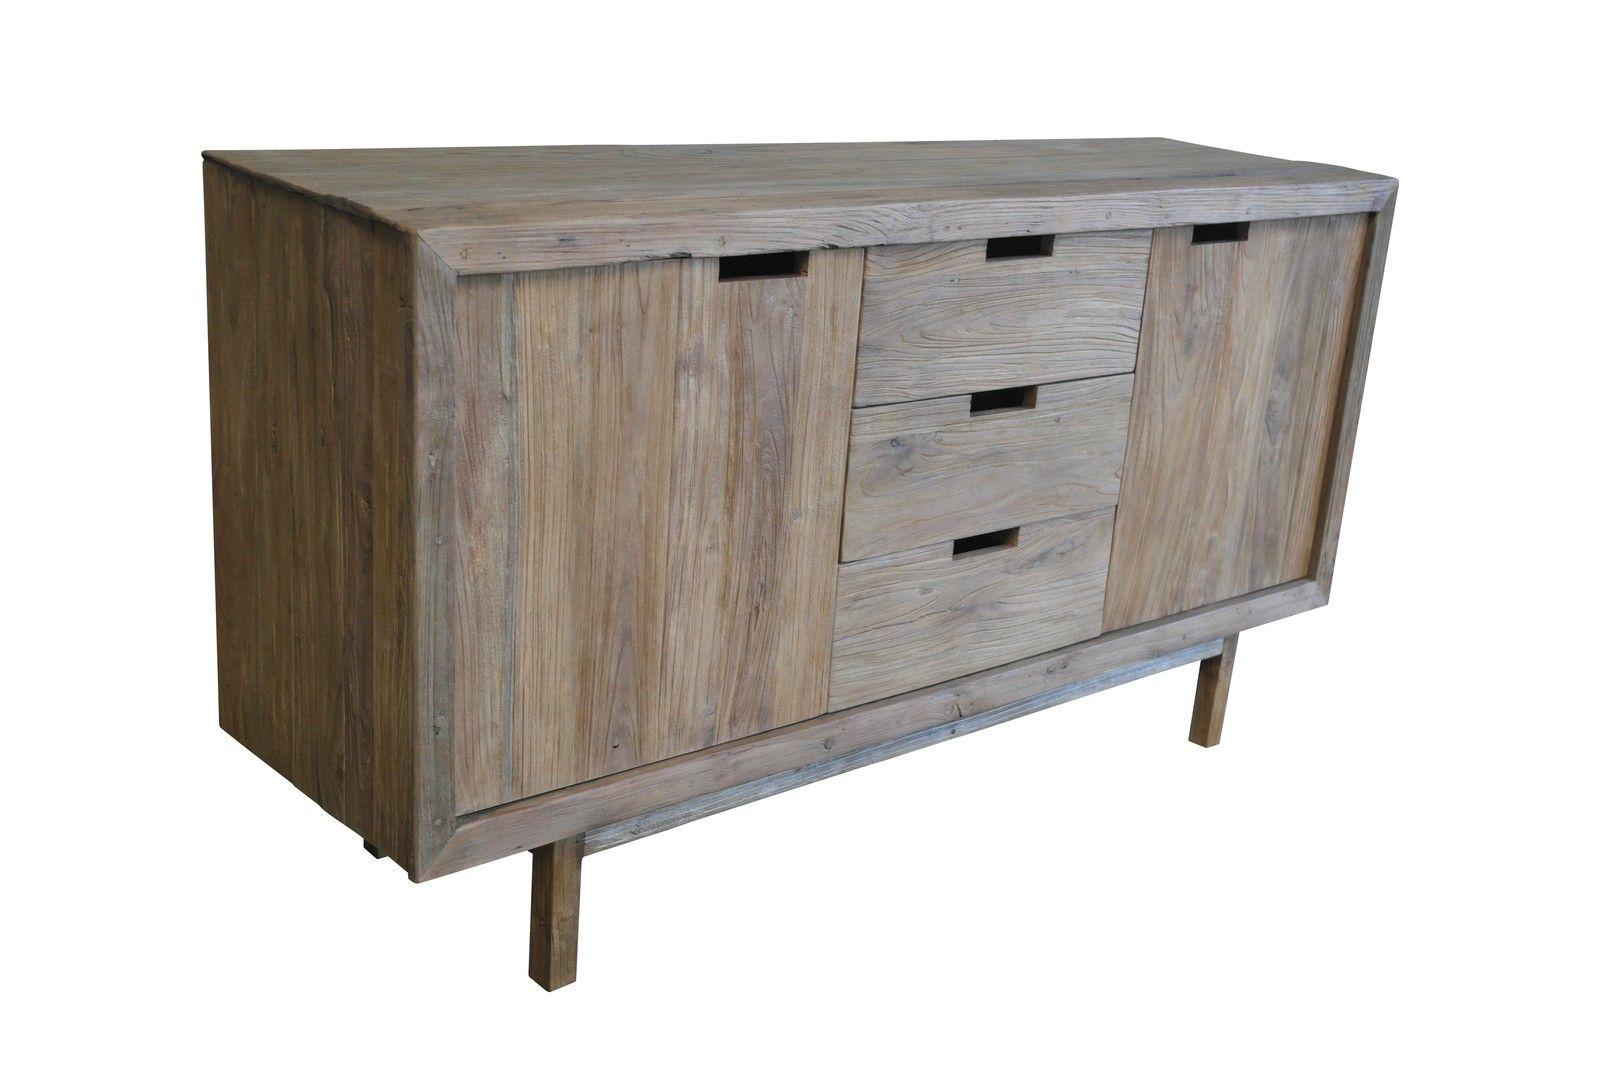 Sit-Möbel, Sideboard-Kommode-Schrank, Teak, Sanur, 122203-01 #moebel ...